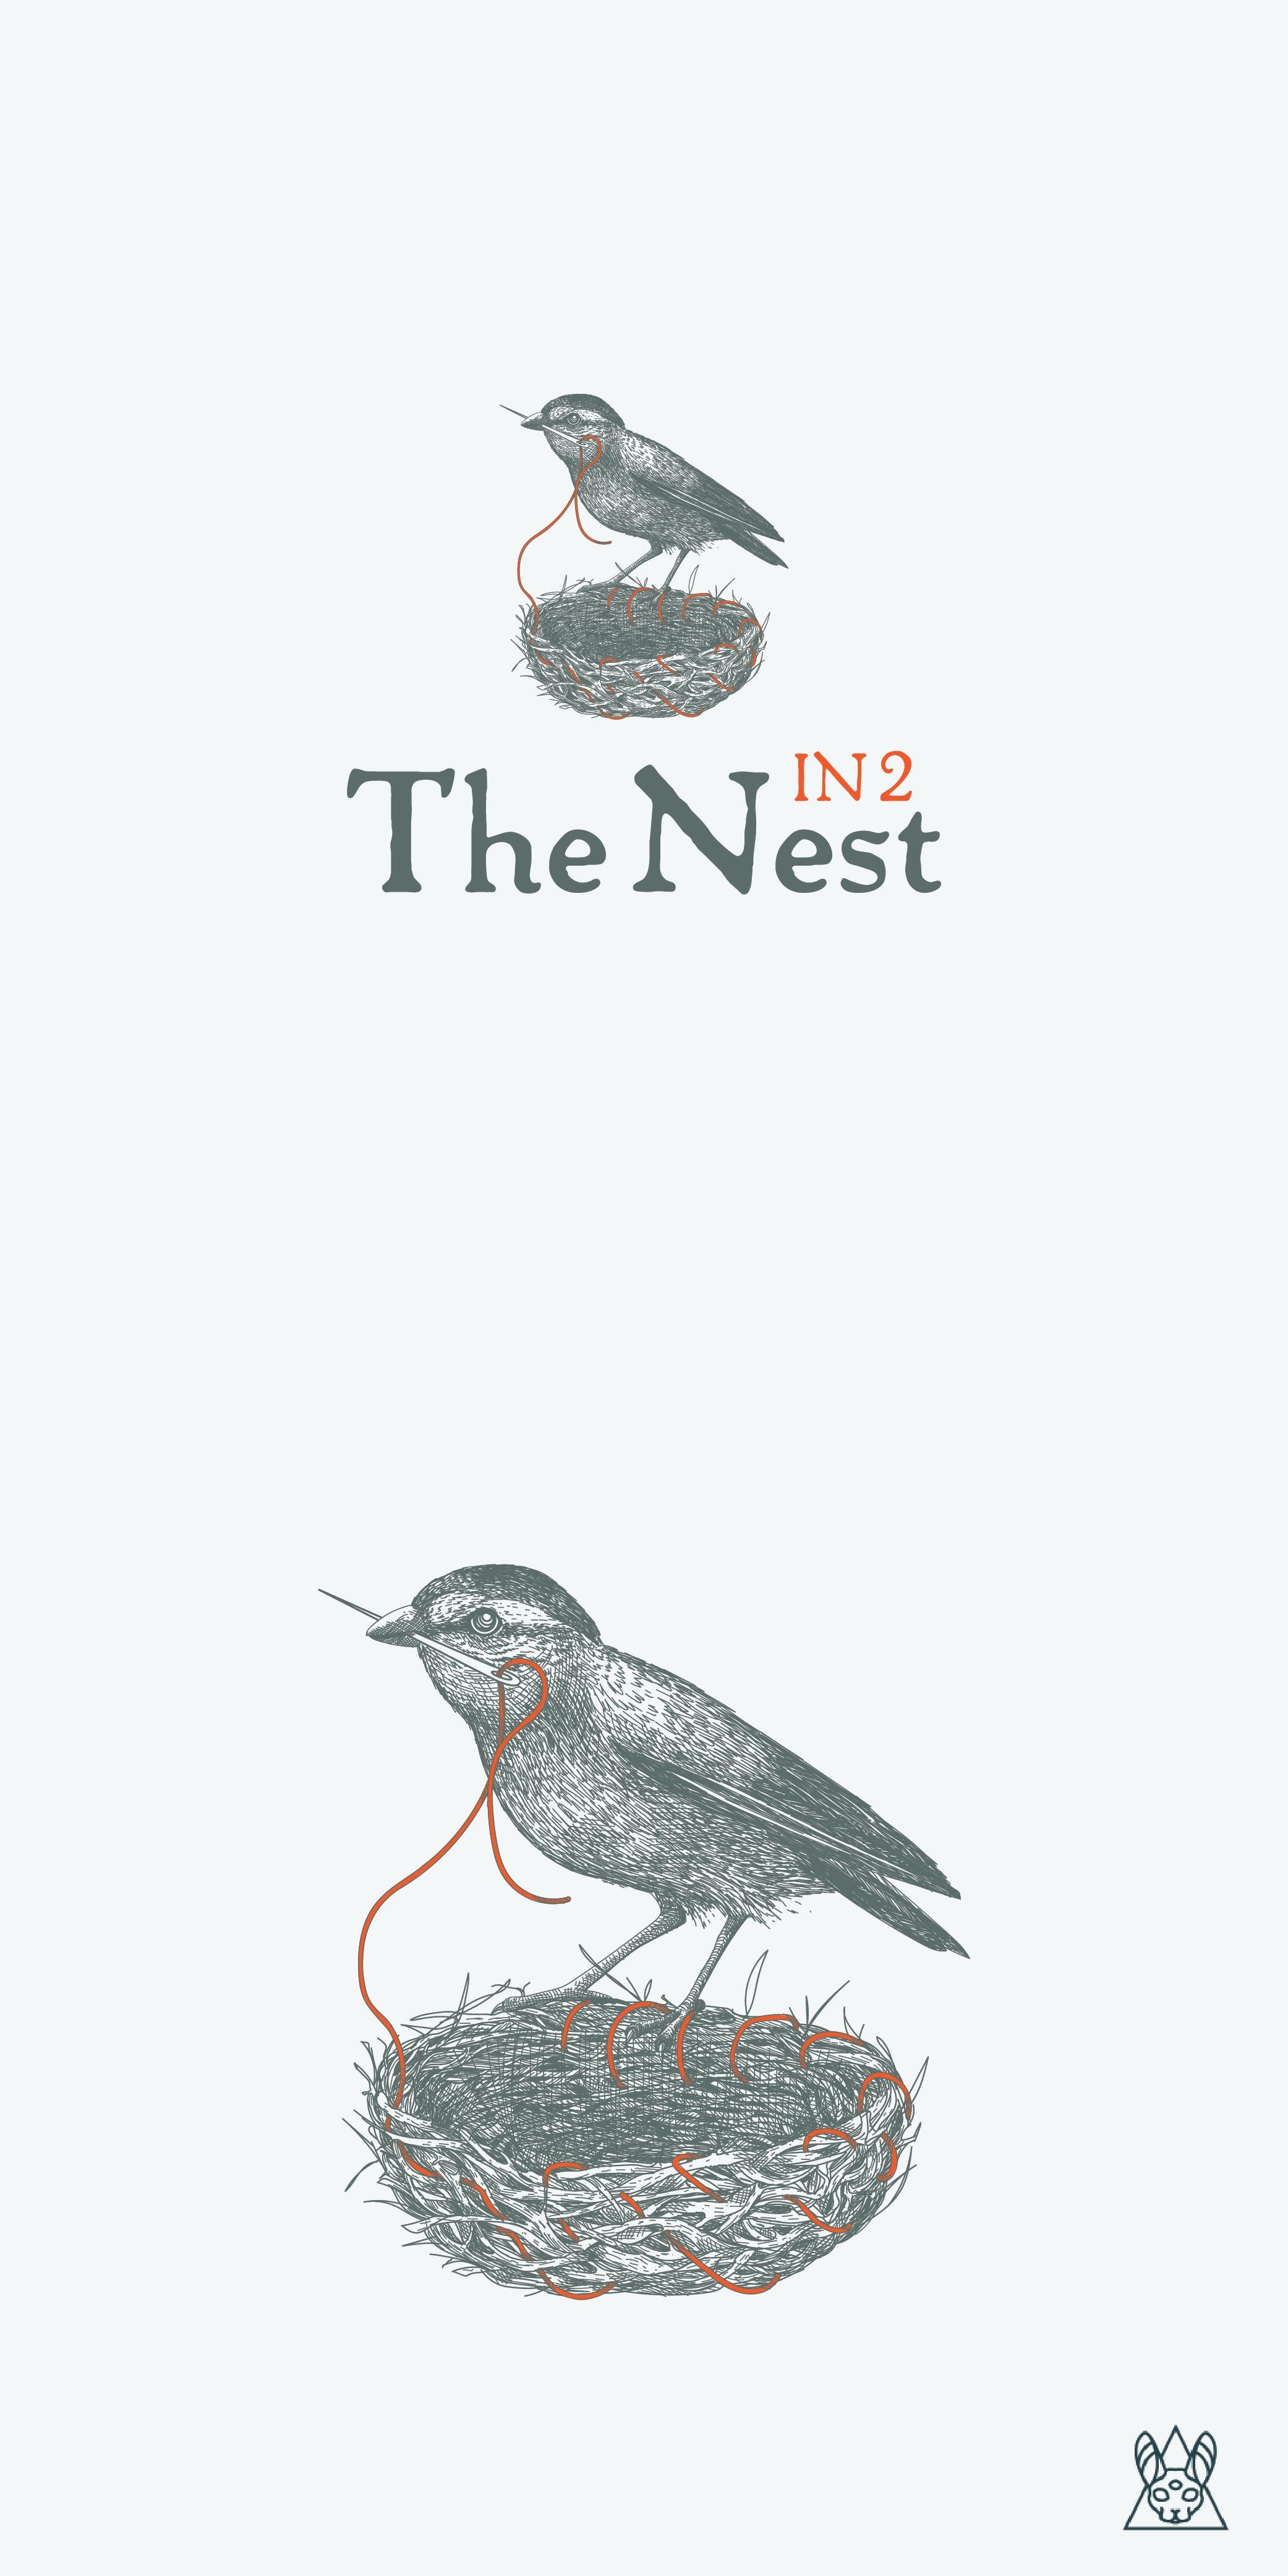 The Nest bird logo